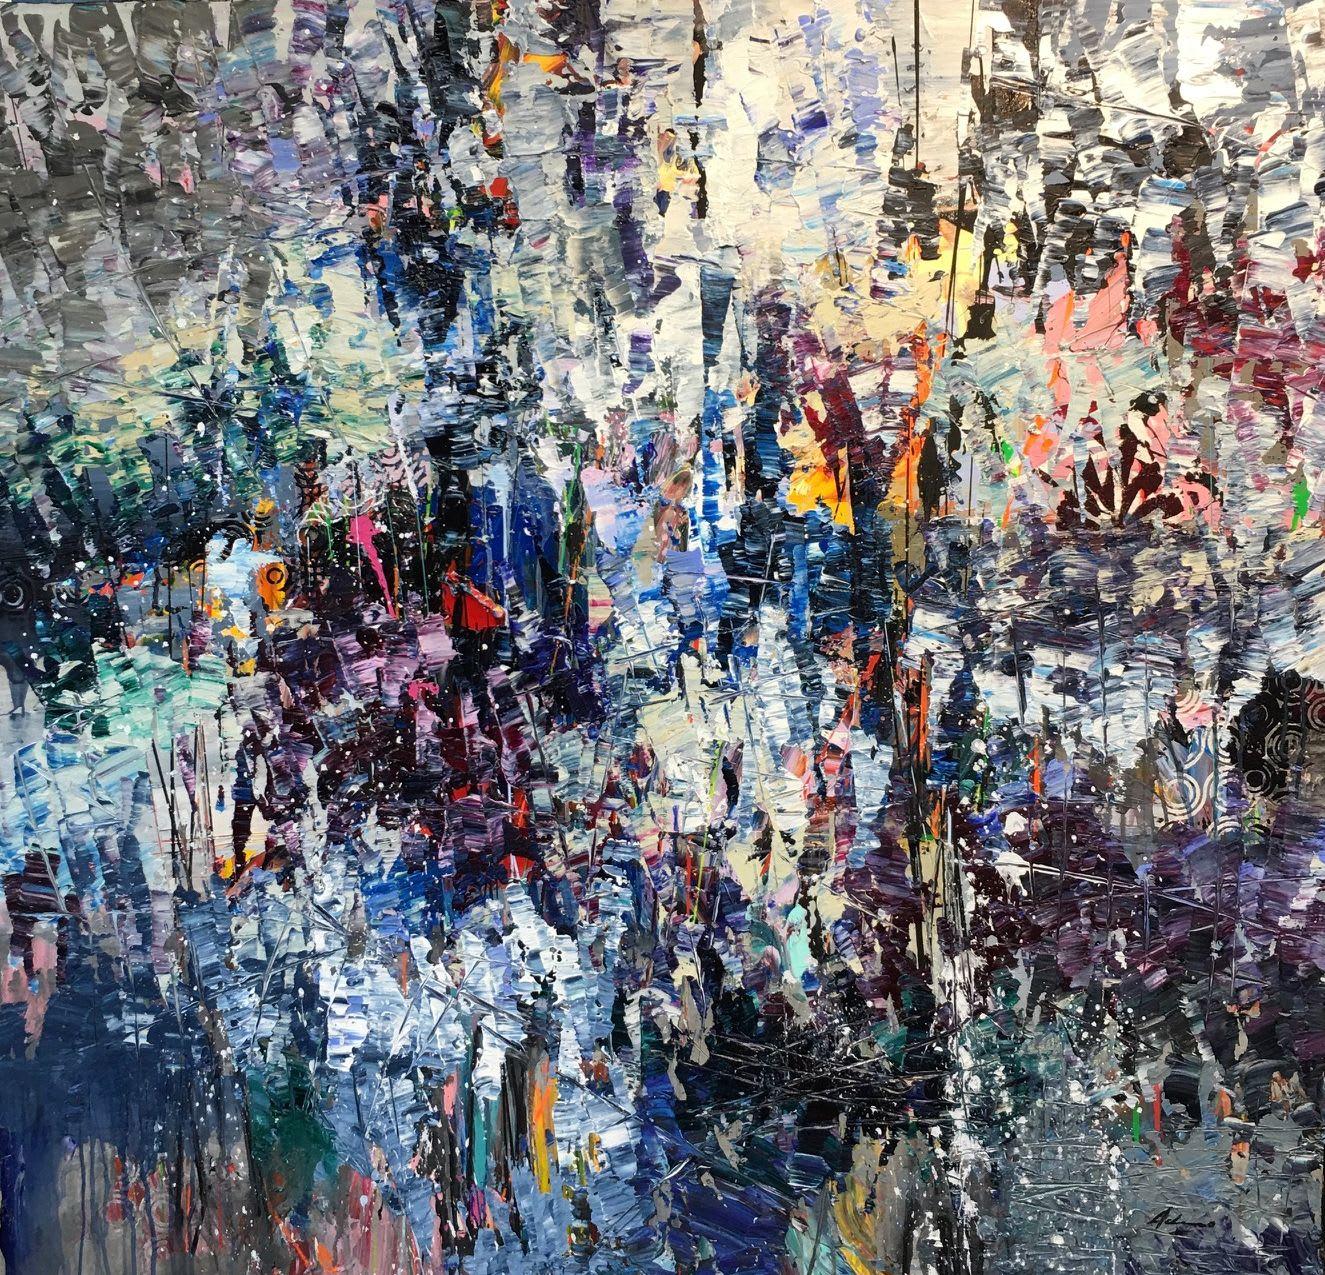 'Depth of Colonialism' by Pietro Adamo at Gallery 133